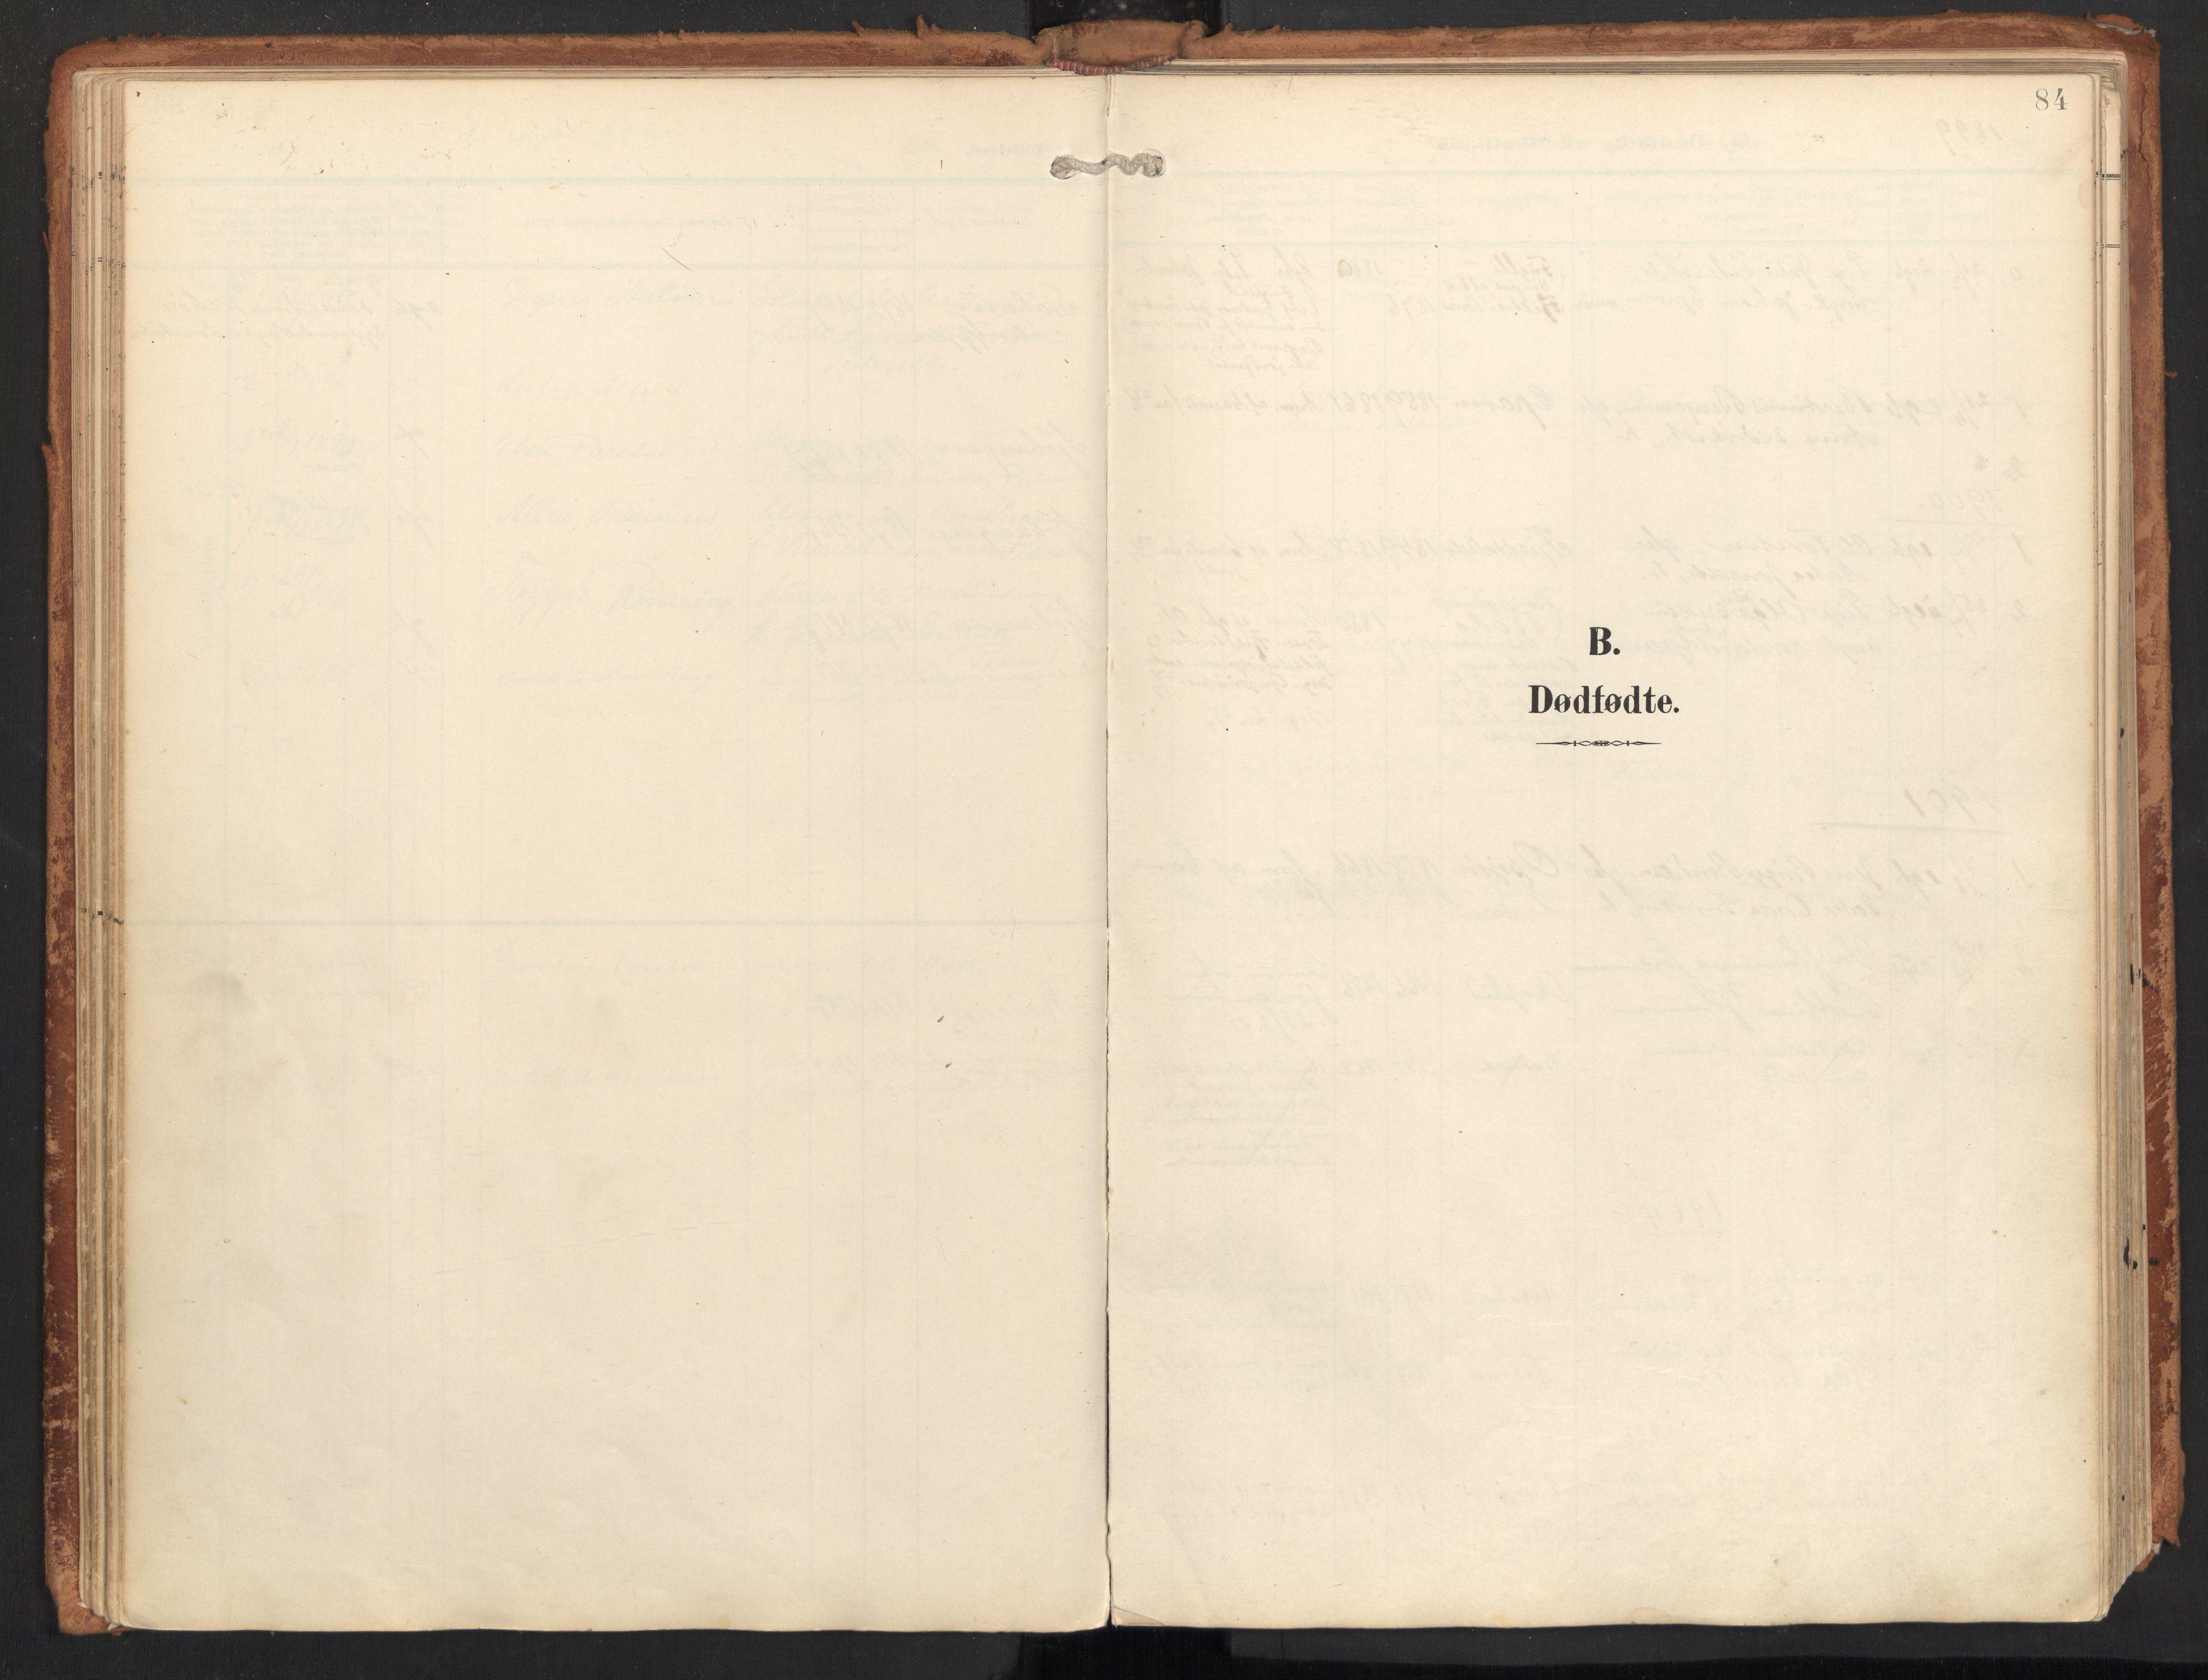 SAT, Ministerialprotokoller, klokkerbøker og fødselsregistre - Nordland, 814/L0227: Ministerialbok nr. 814A08, 1899-1920, s. 84